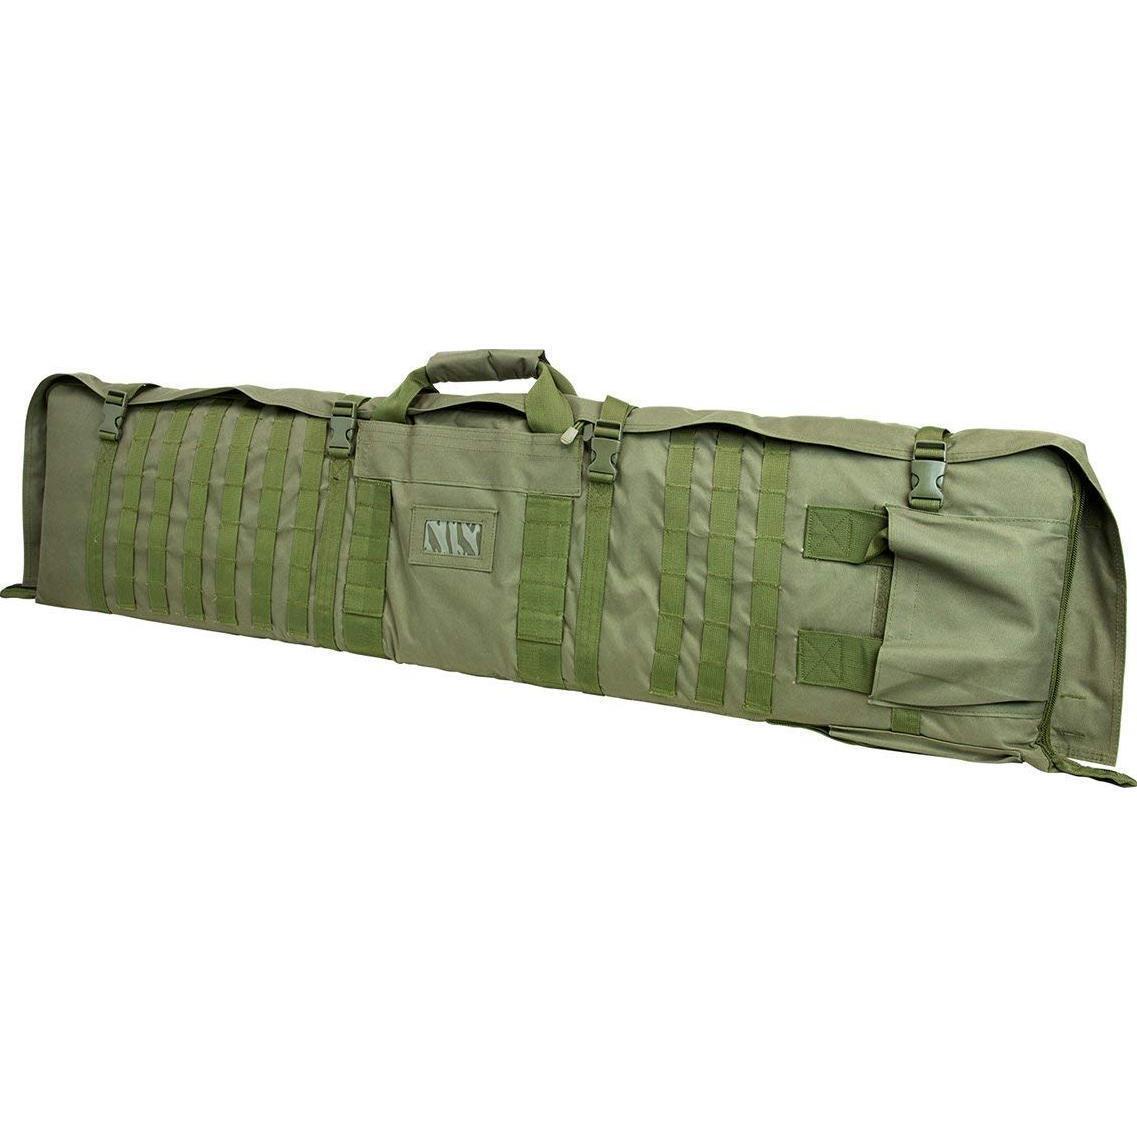 NCSTAR Tactical 48  verde maletín para rifles que se despliega a una estera de disparo de 66